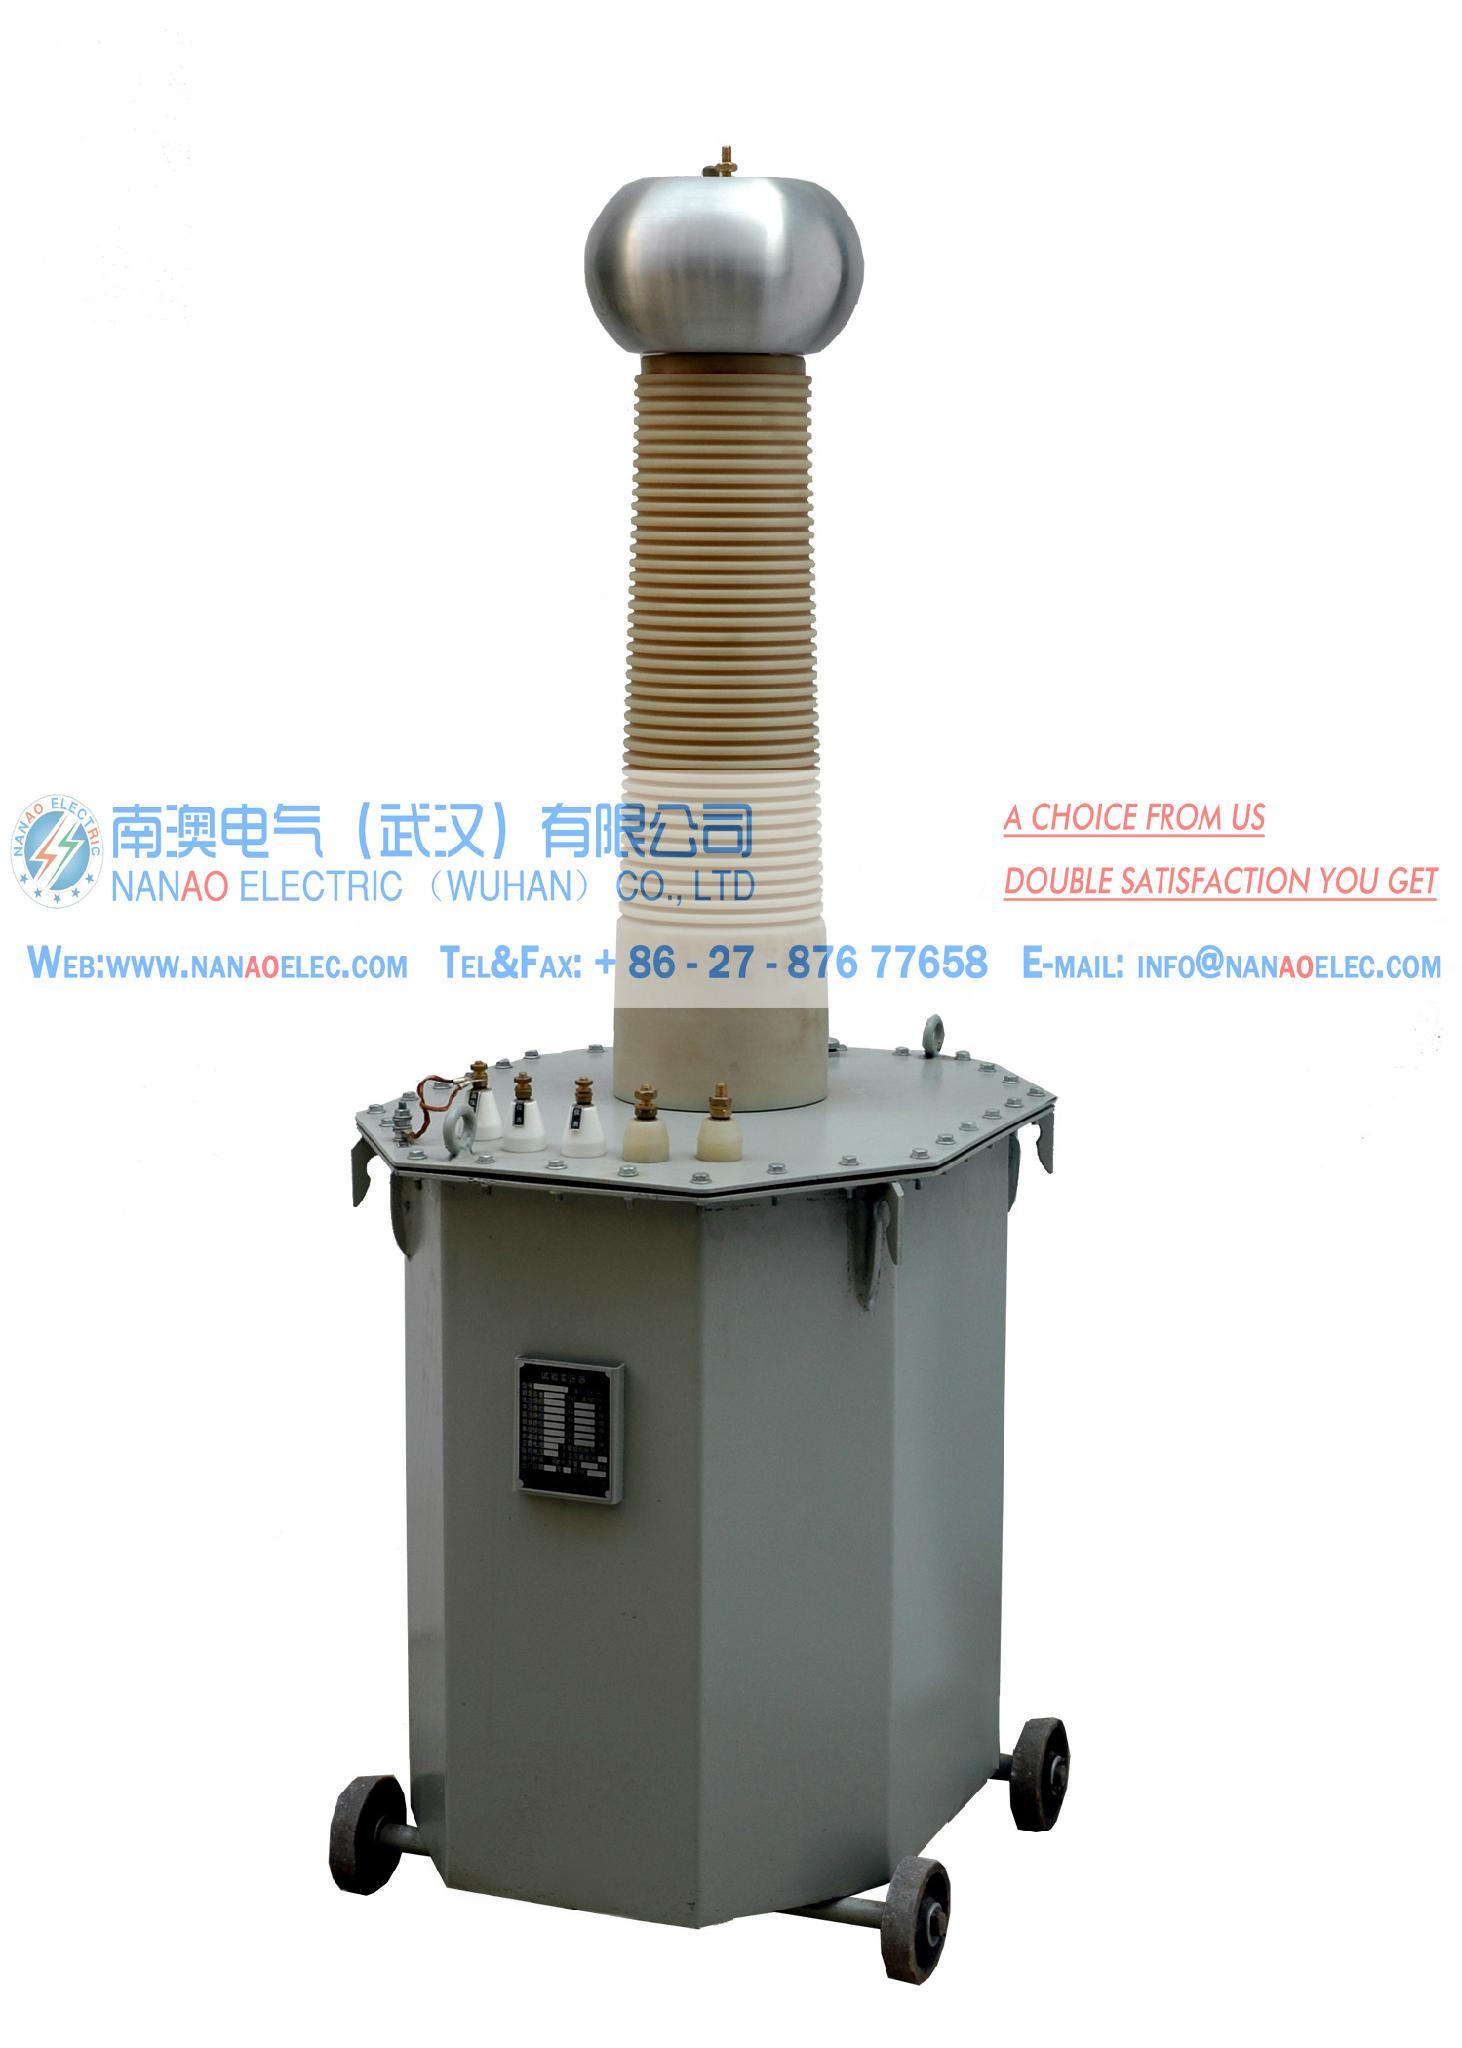 NAYDJ油浸式高電壓試驗變壓器耐壓成套裝置 5